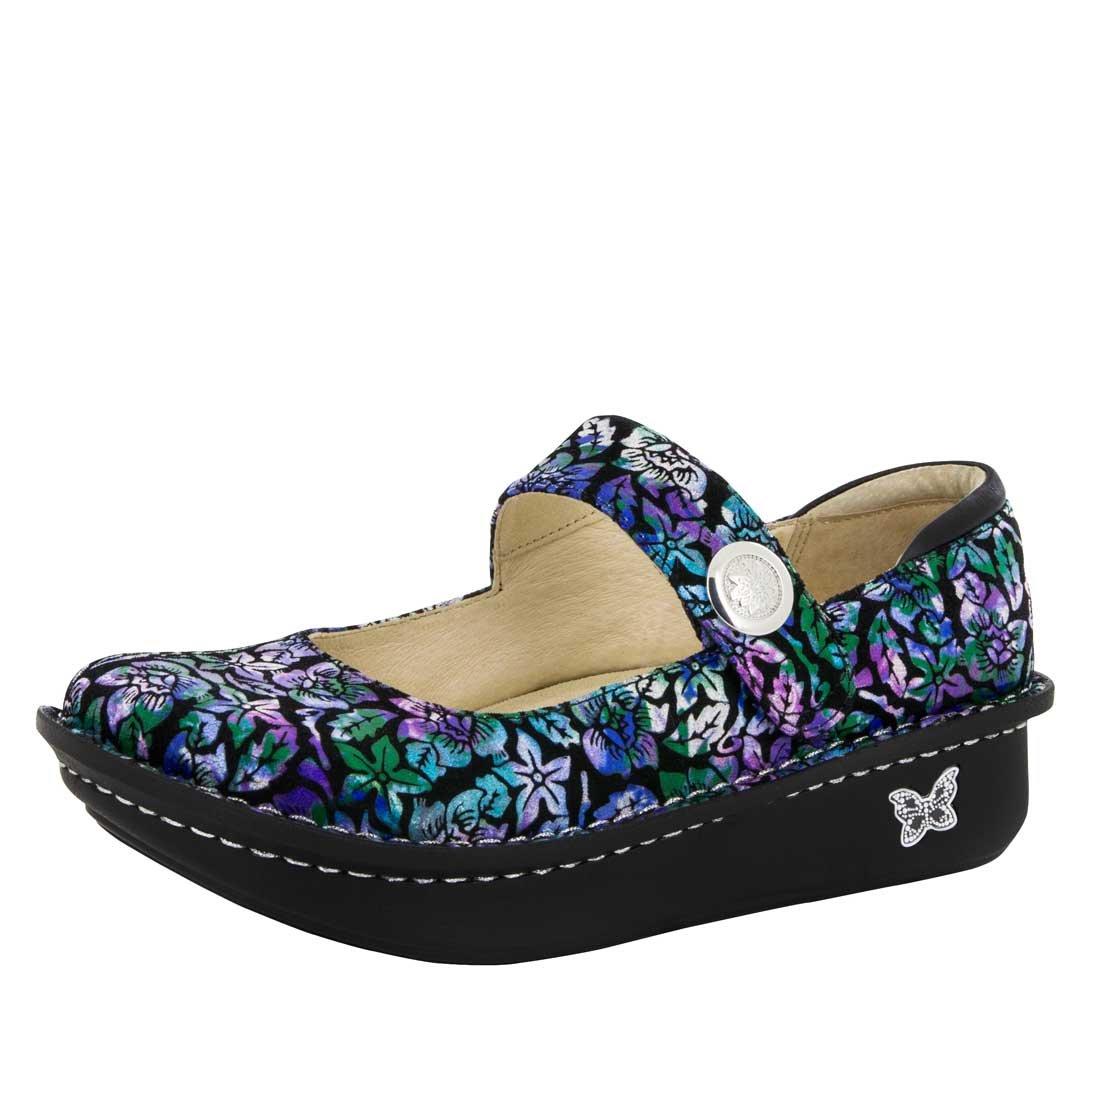 Alegria レディース パロマフラット靴 B0055J77XE 36 M EU / 6-6.5 B(M) US Western Romance Western Romance 36 M EU / 6-6.5 B(M) US